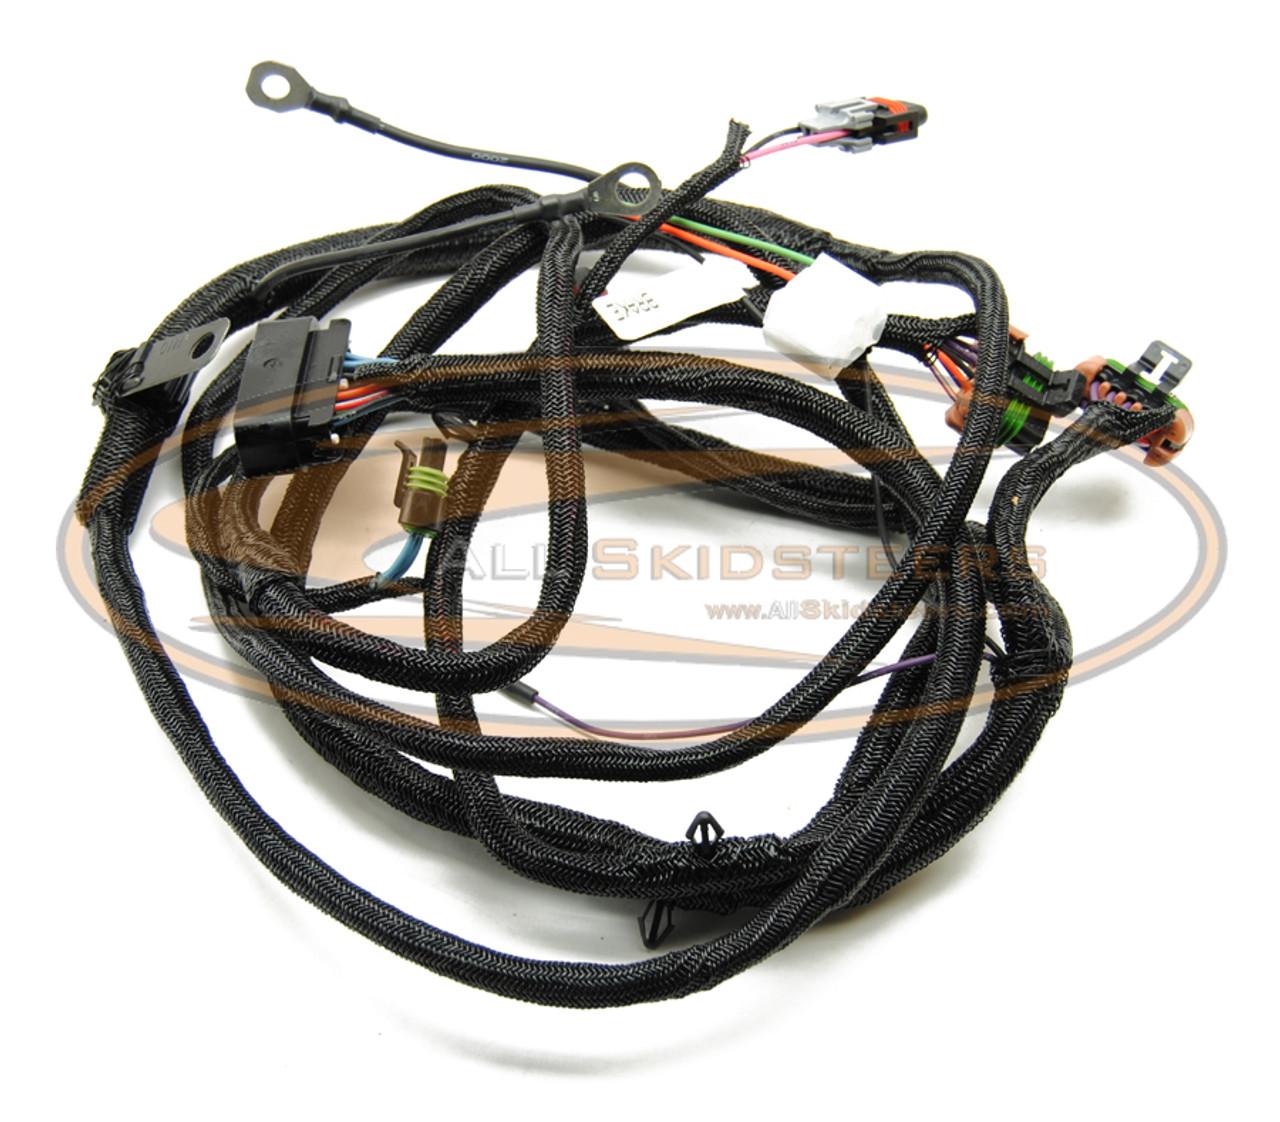 Wiring Harness Oem